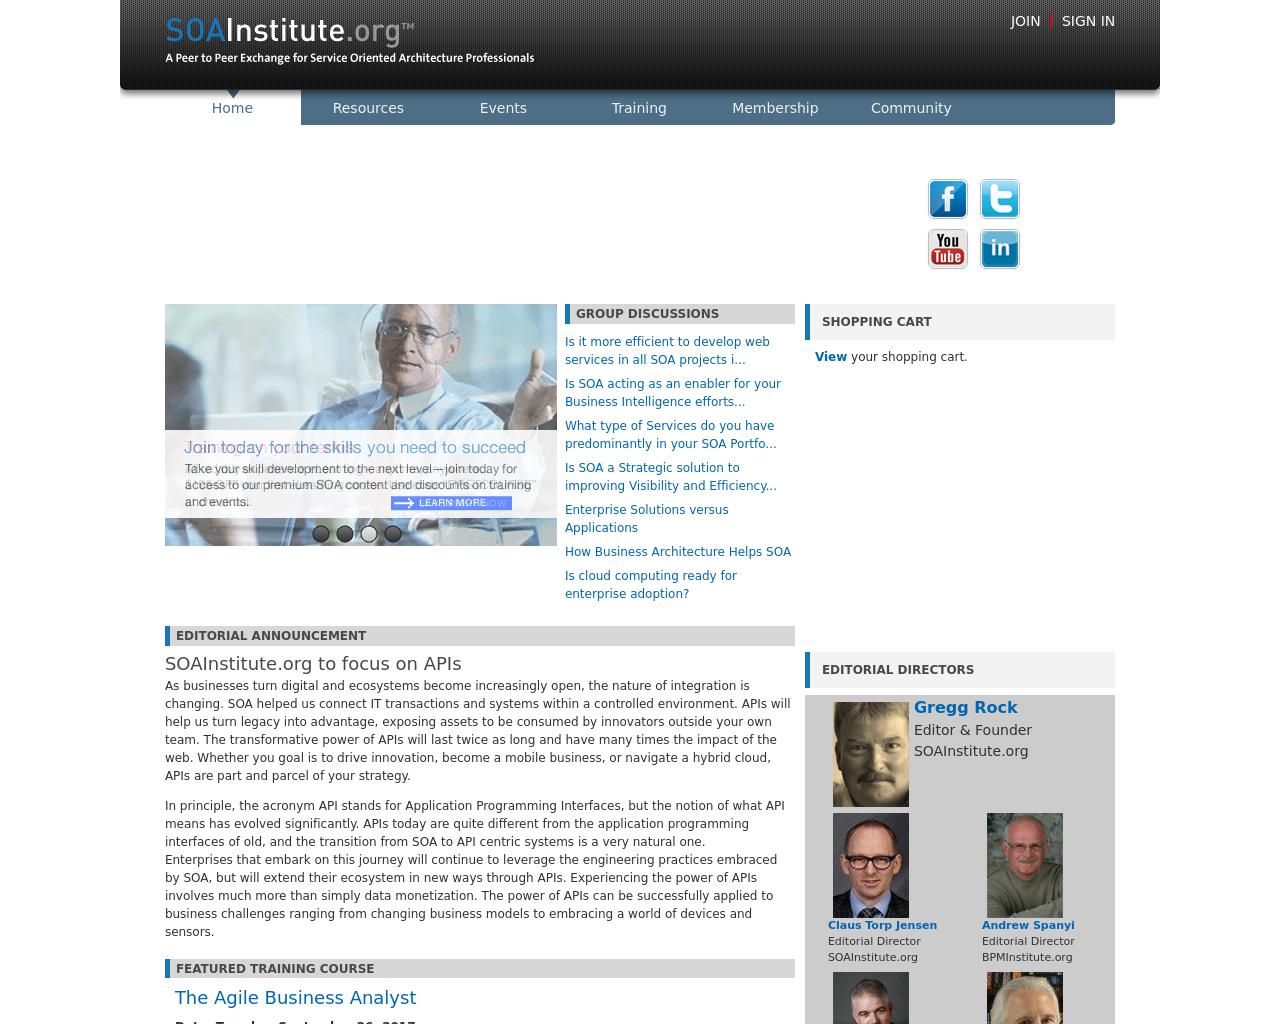 Soainstitute-Advertising-Reviews-Pricing